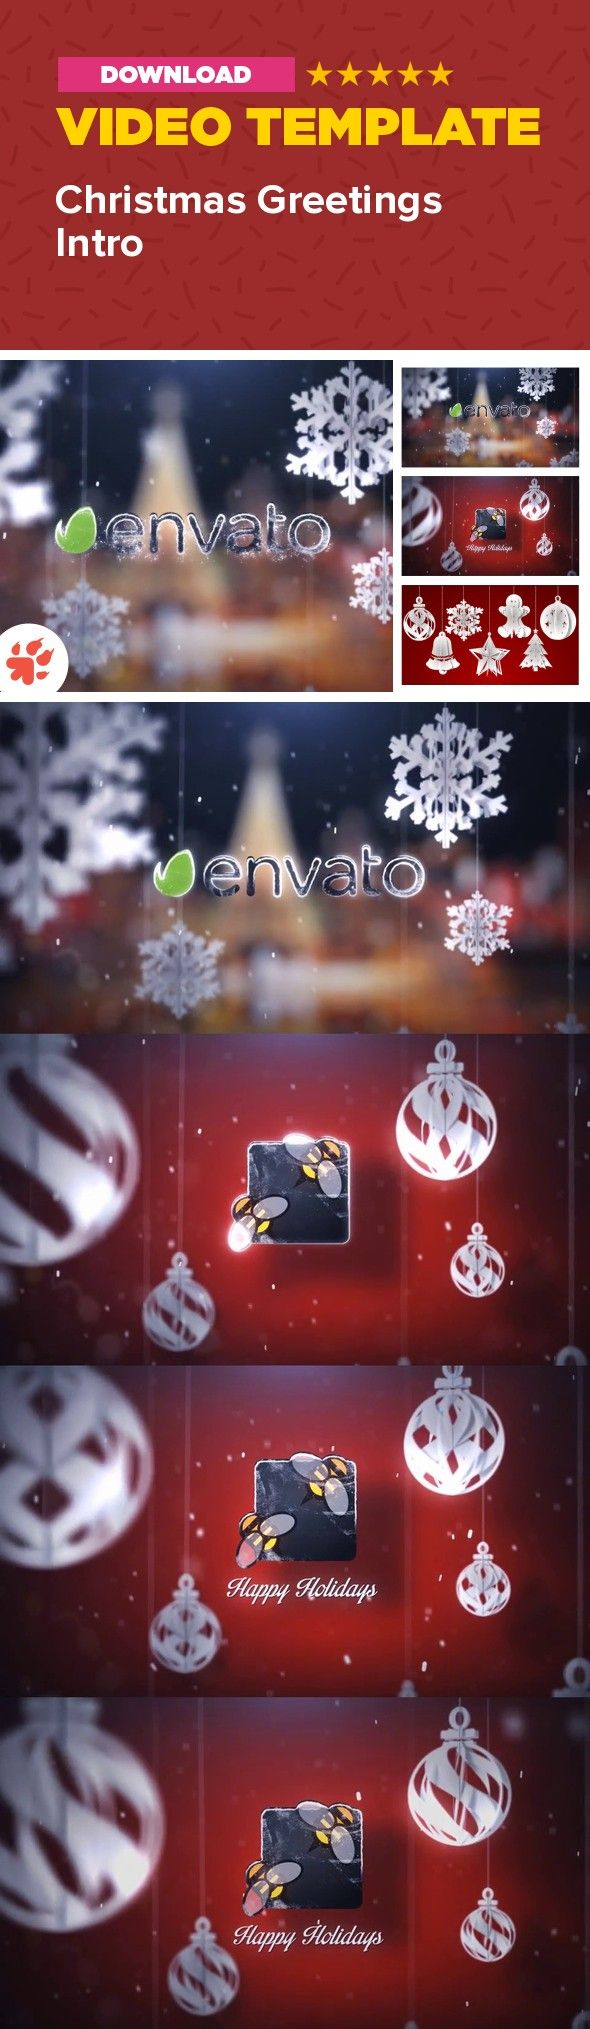 celebration, christmas, elegant, greetings, holliday, intro, logo, magical, merry christmas, opener, seasons, snow, winter, wishes, xmas ricardo, greetings, happy new year, holiday, logo, magical, merry christmas, pop up, present, snow, xmas,  3d, animation, card, cartoon, character, christmas, claus, magic, santa, sky, star, winter, xmas, corporate, epic, film, greeting, holidays, ident, intro, movie, season, stylish, titles, trailer, 3d intro, countdown, opener, snowflake, celebration…